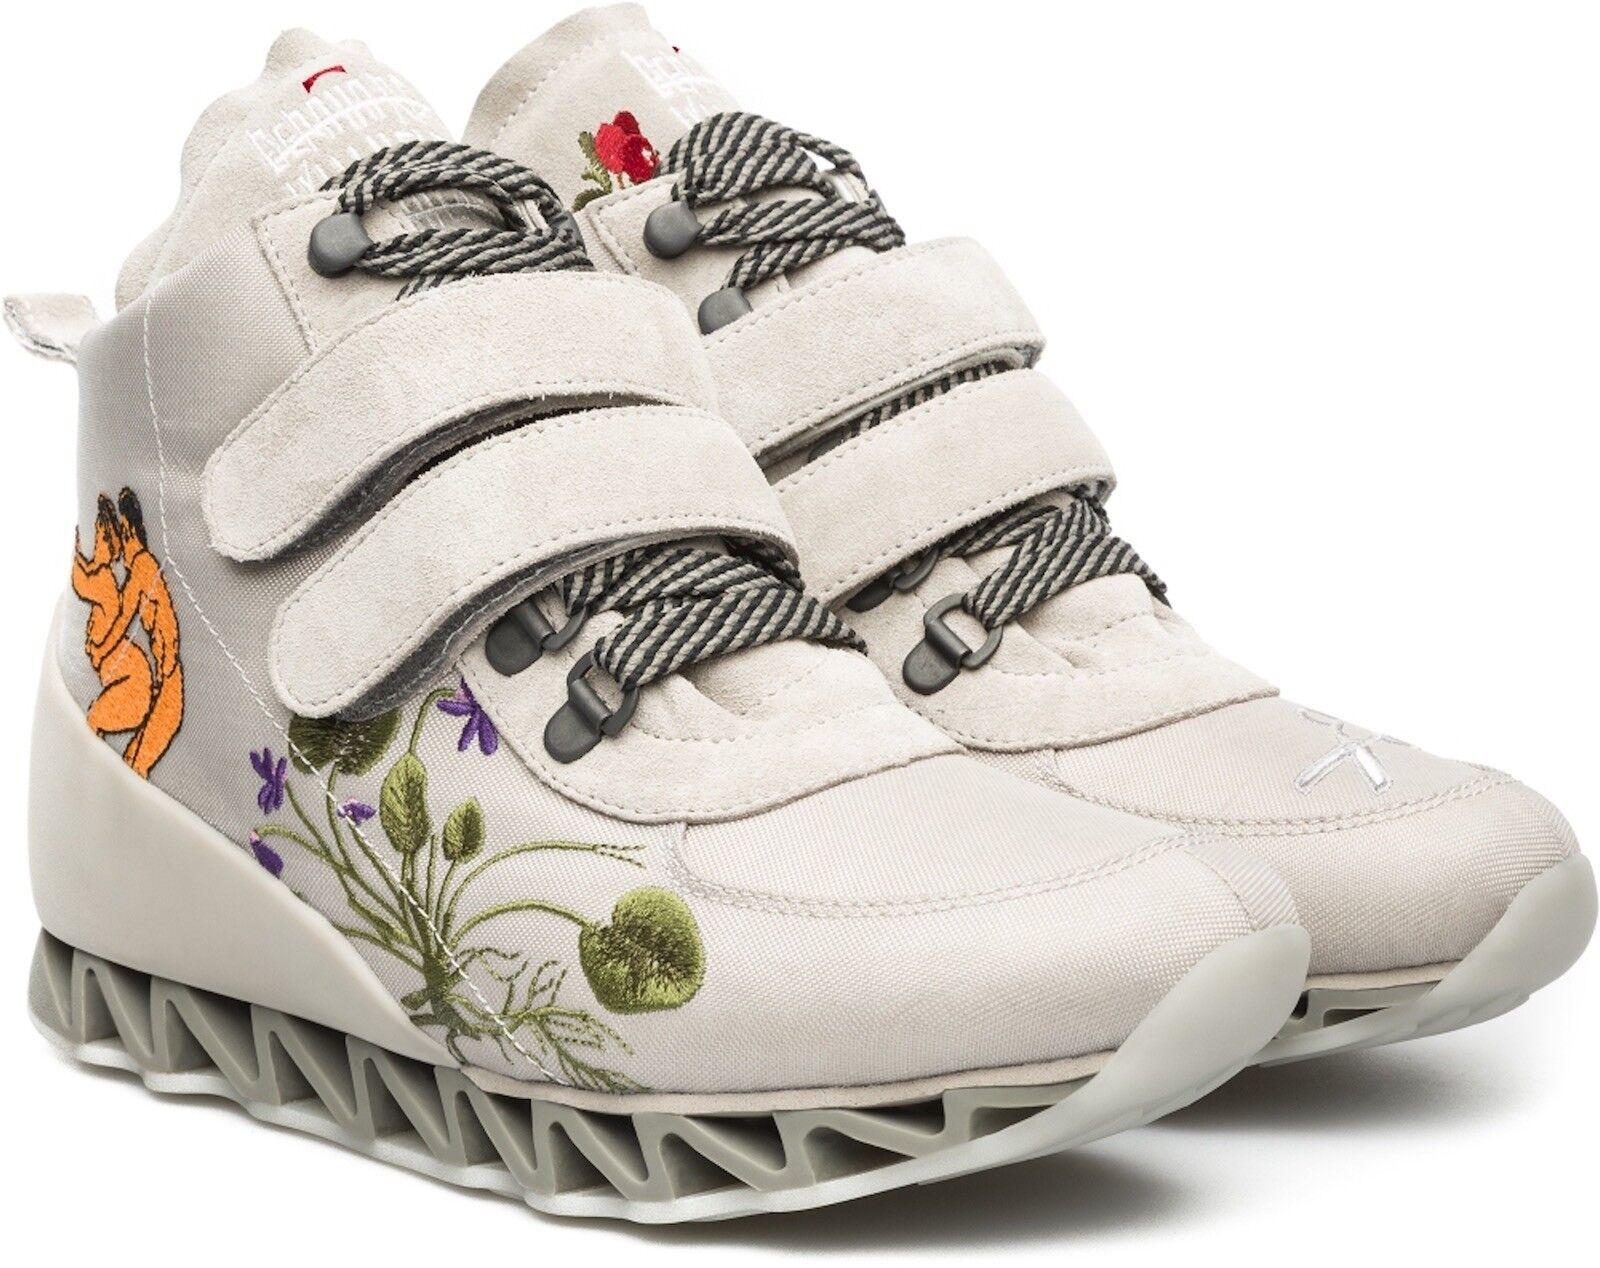 Bernhard Willhelm Camper US 9 Together Himalayan Sneakers 46839-001